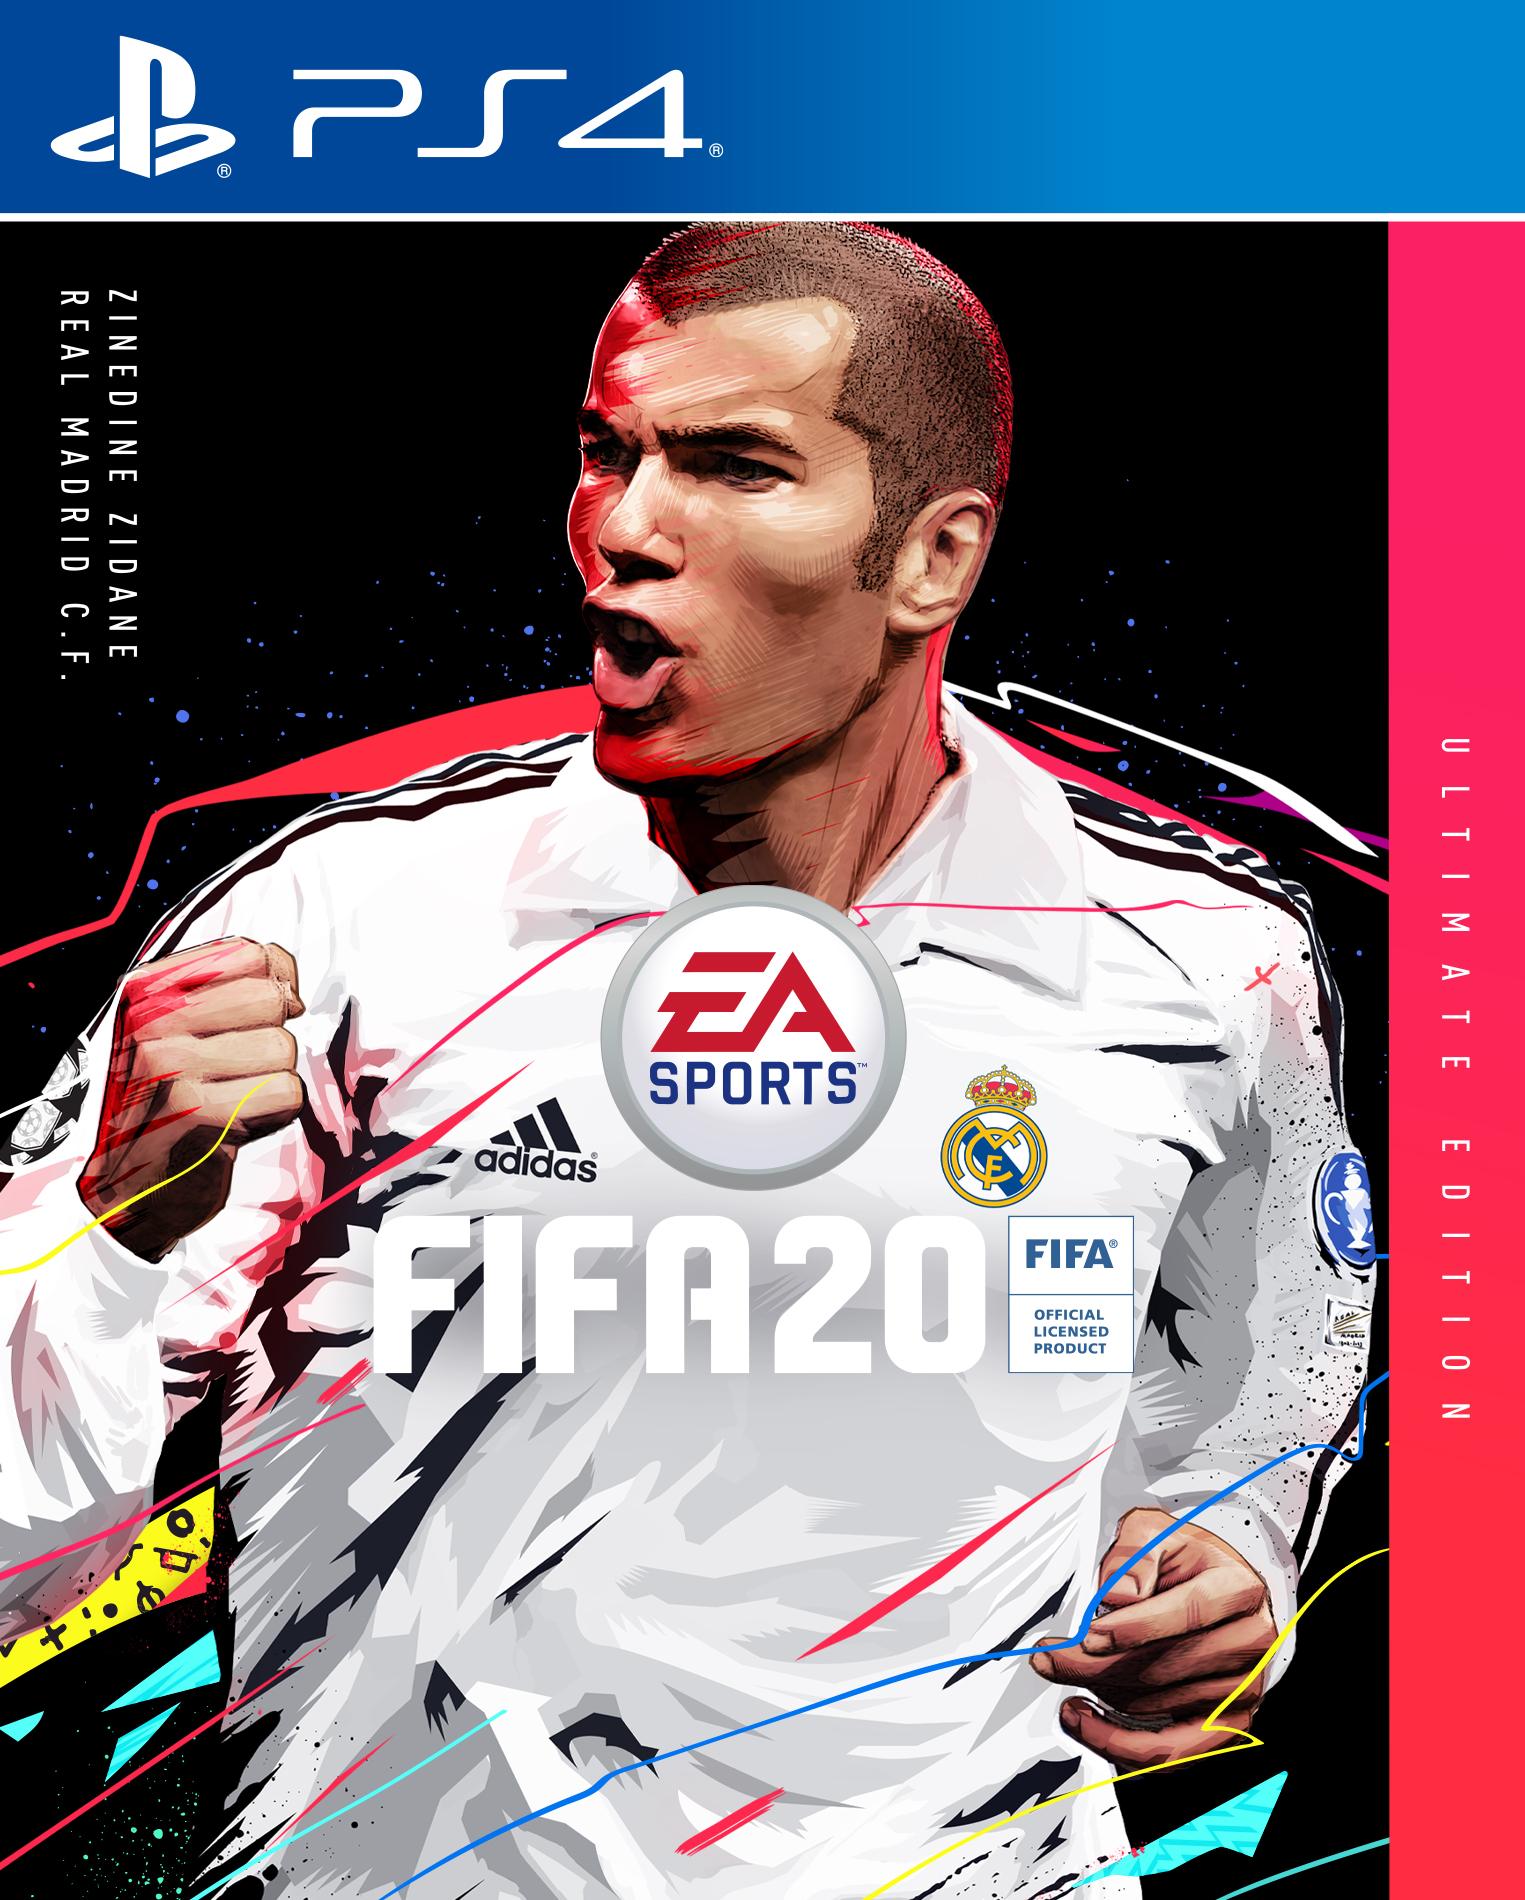 fifa 20 zidane cover